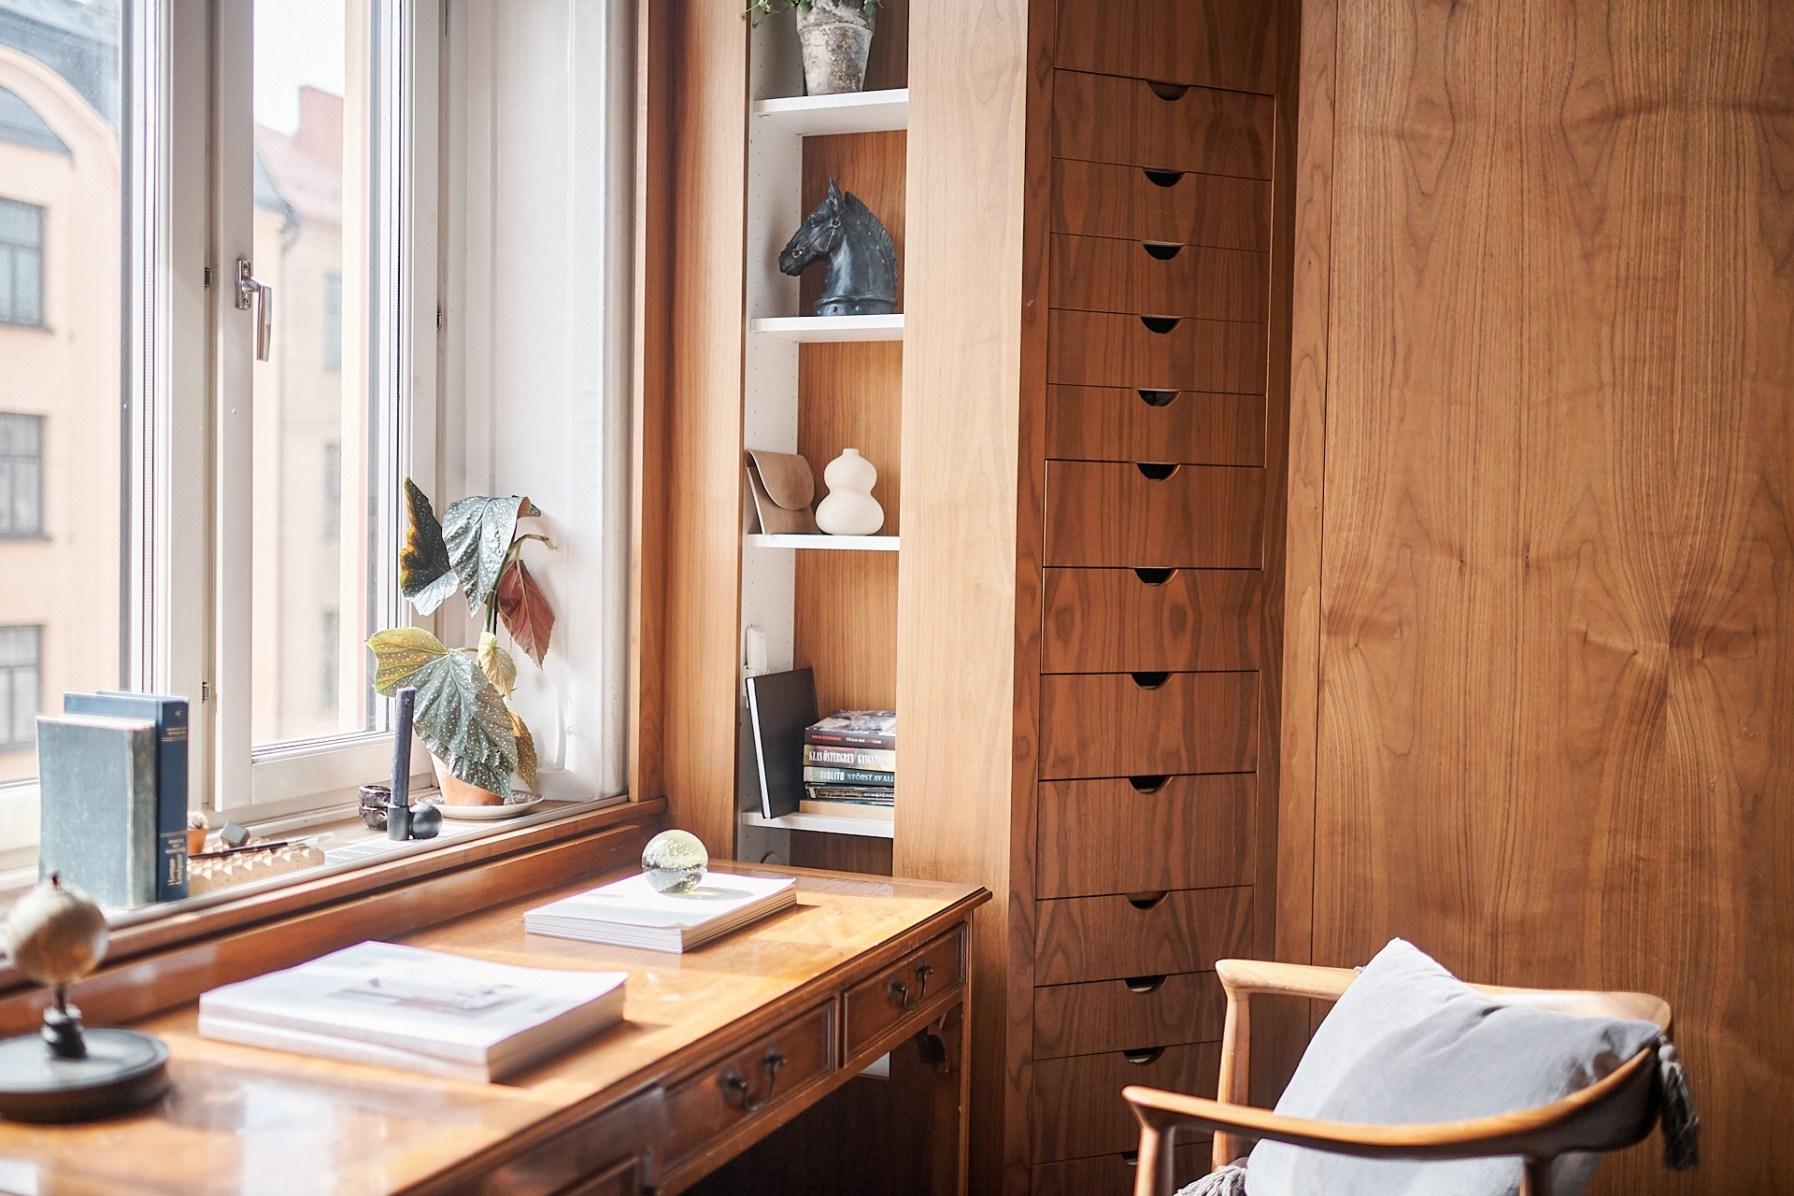 window wooden sill shelves desk